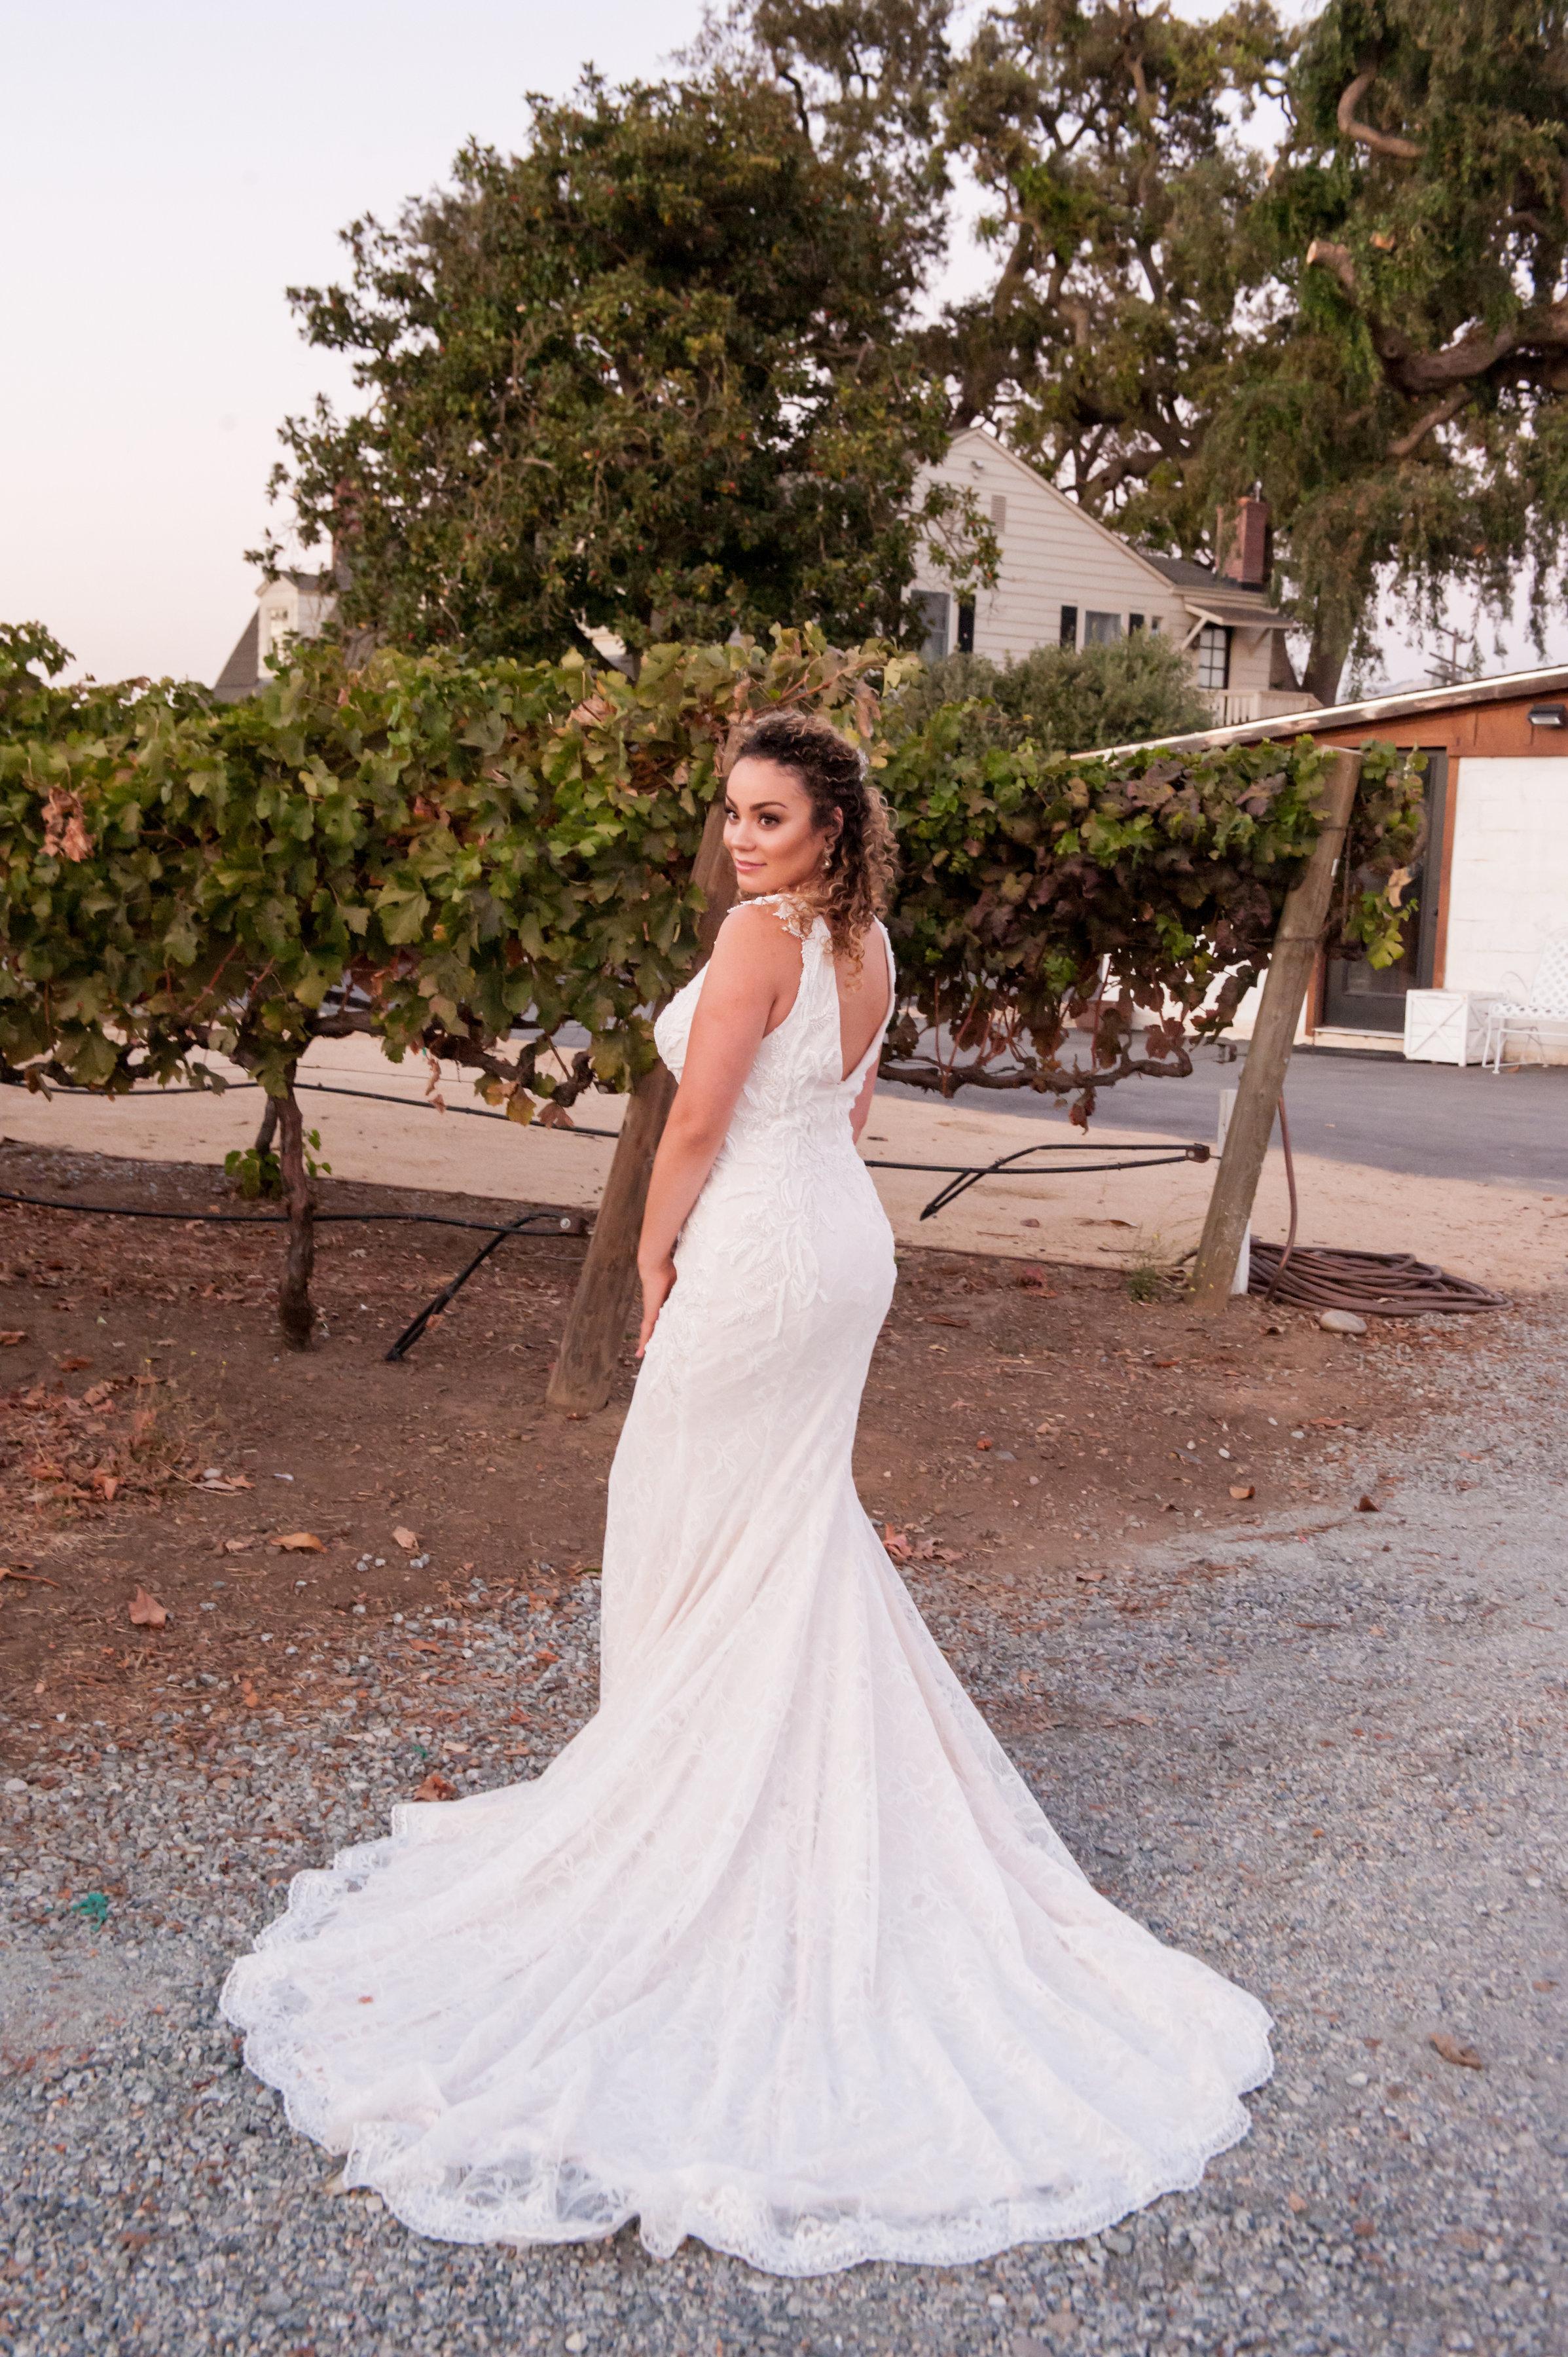 jen Vazquez wedding photography epiphany bride in Justin Alexander